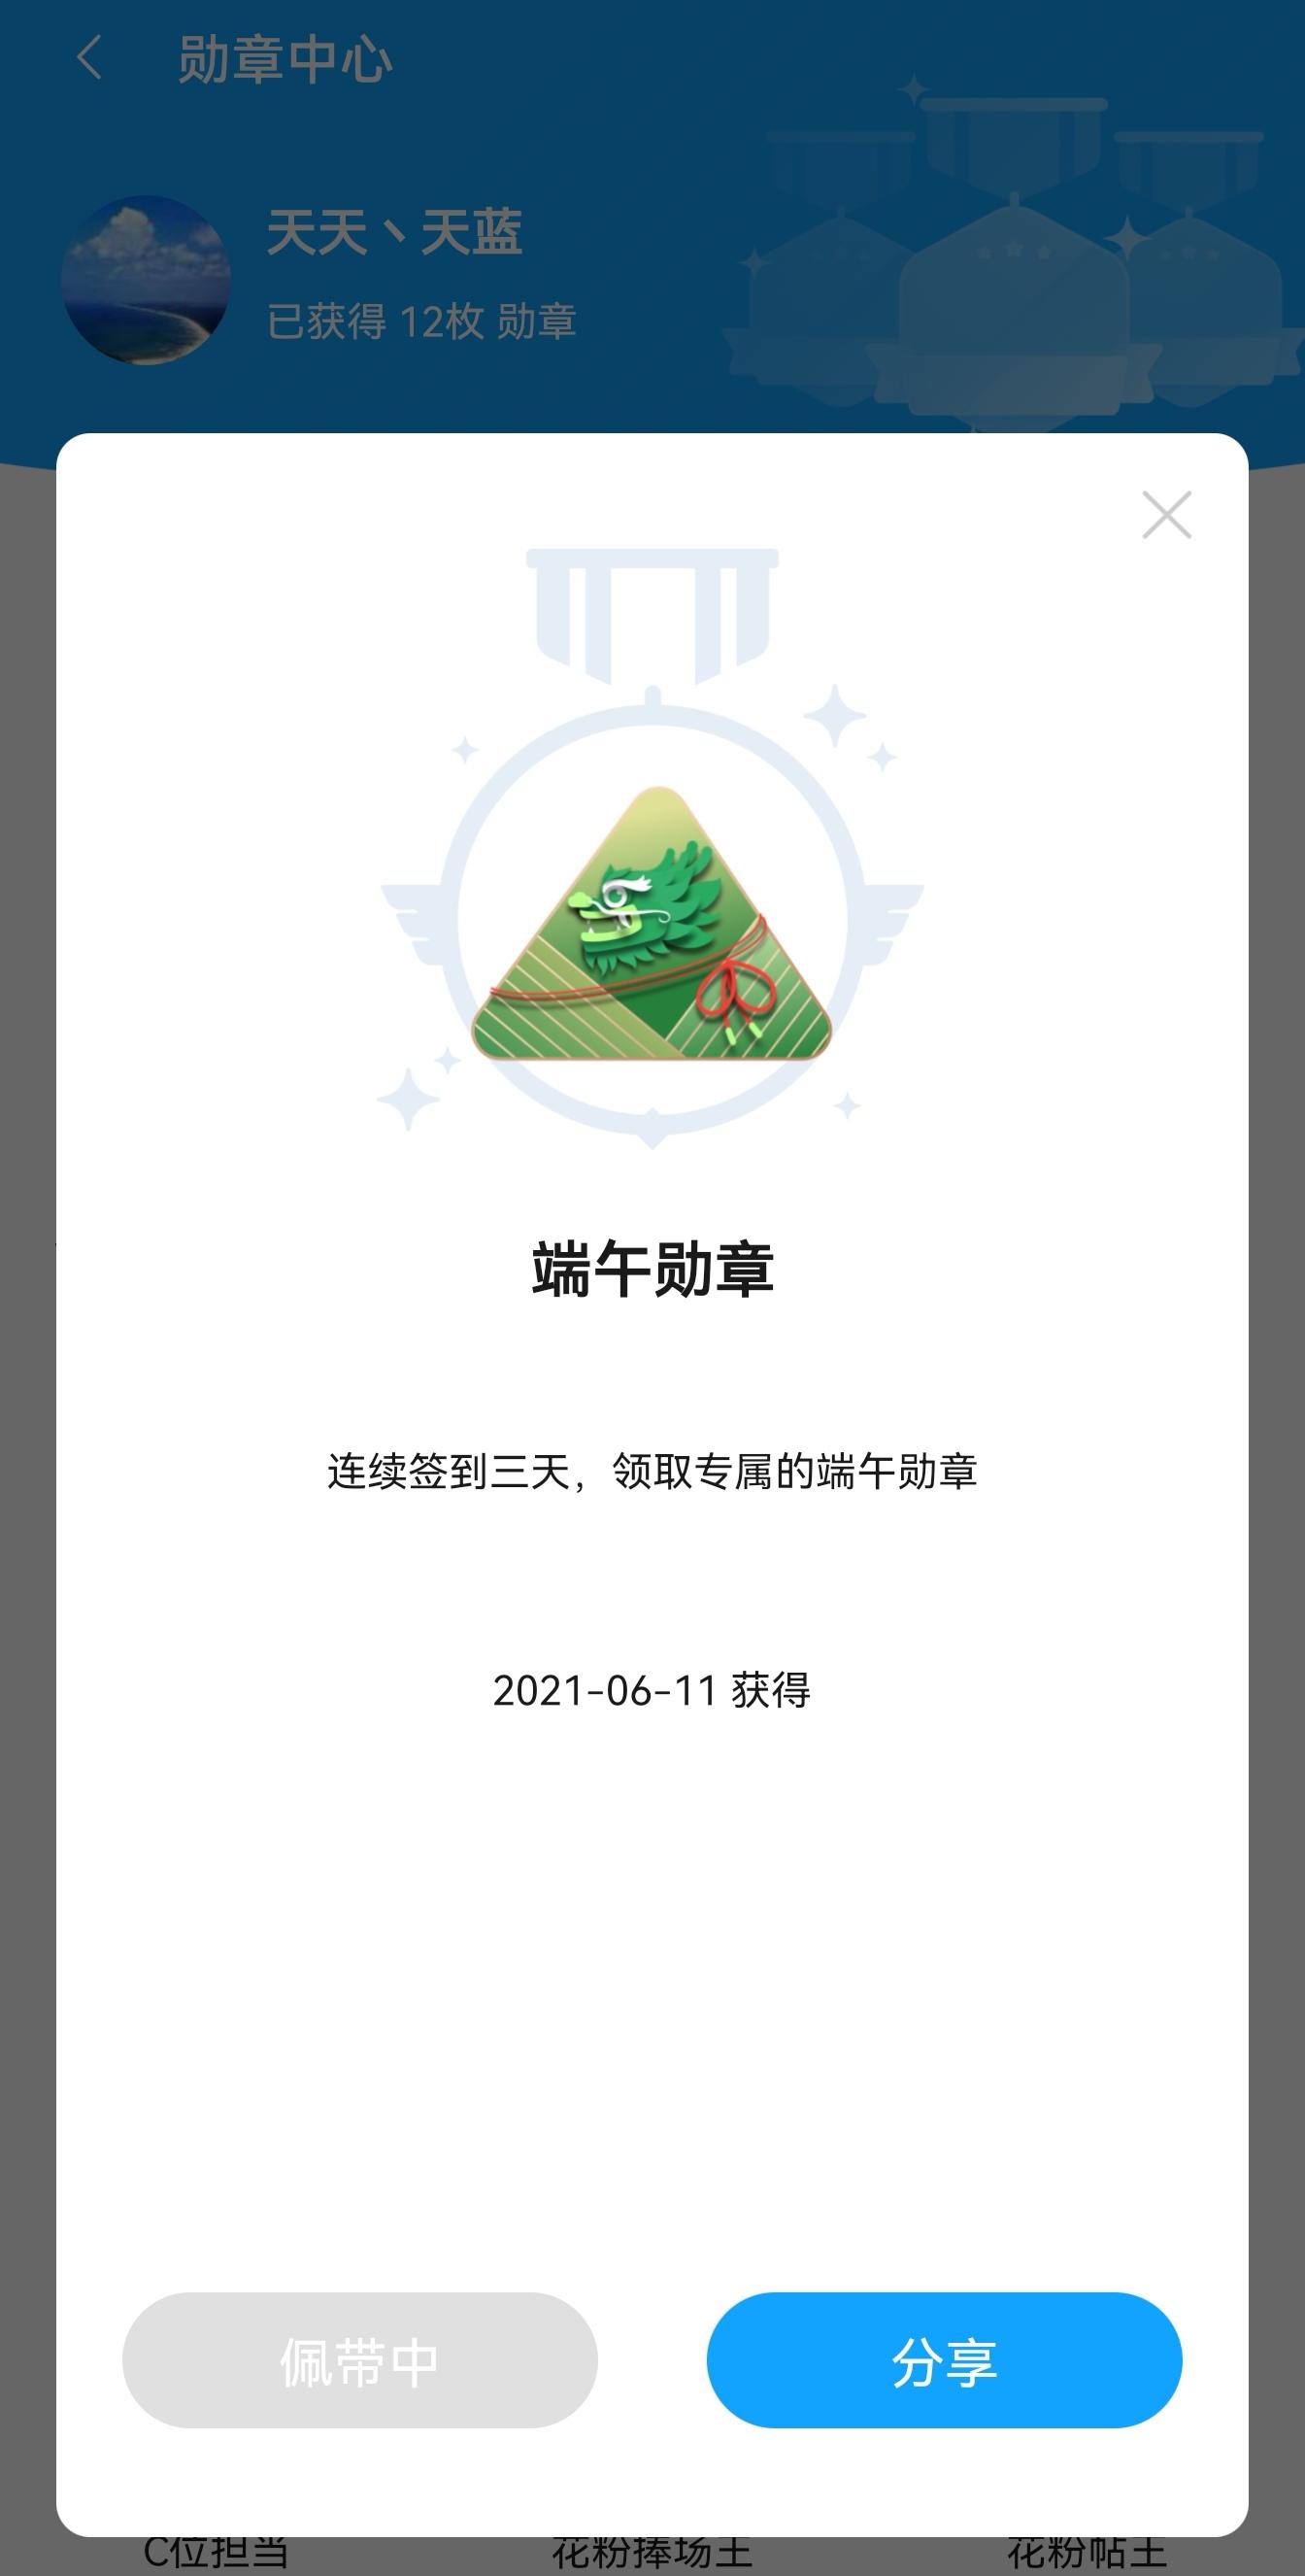 Screenshot_20210611_200727_com.huawei.fans_edit_87024458812241.jpg